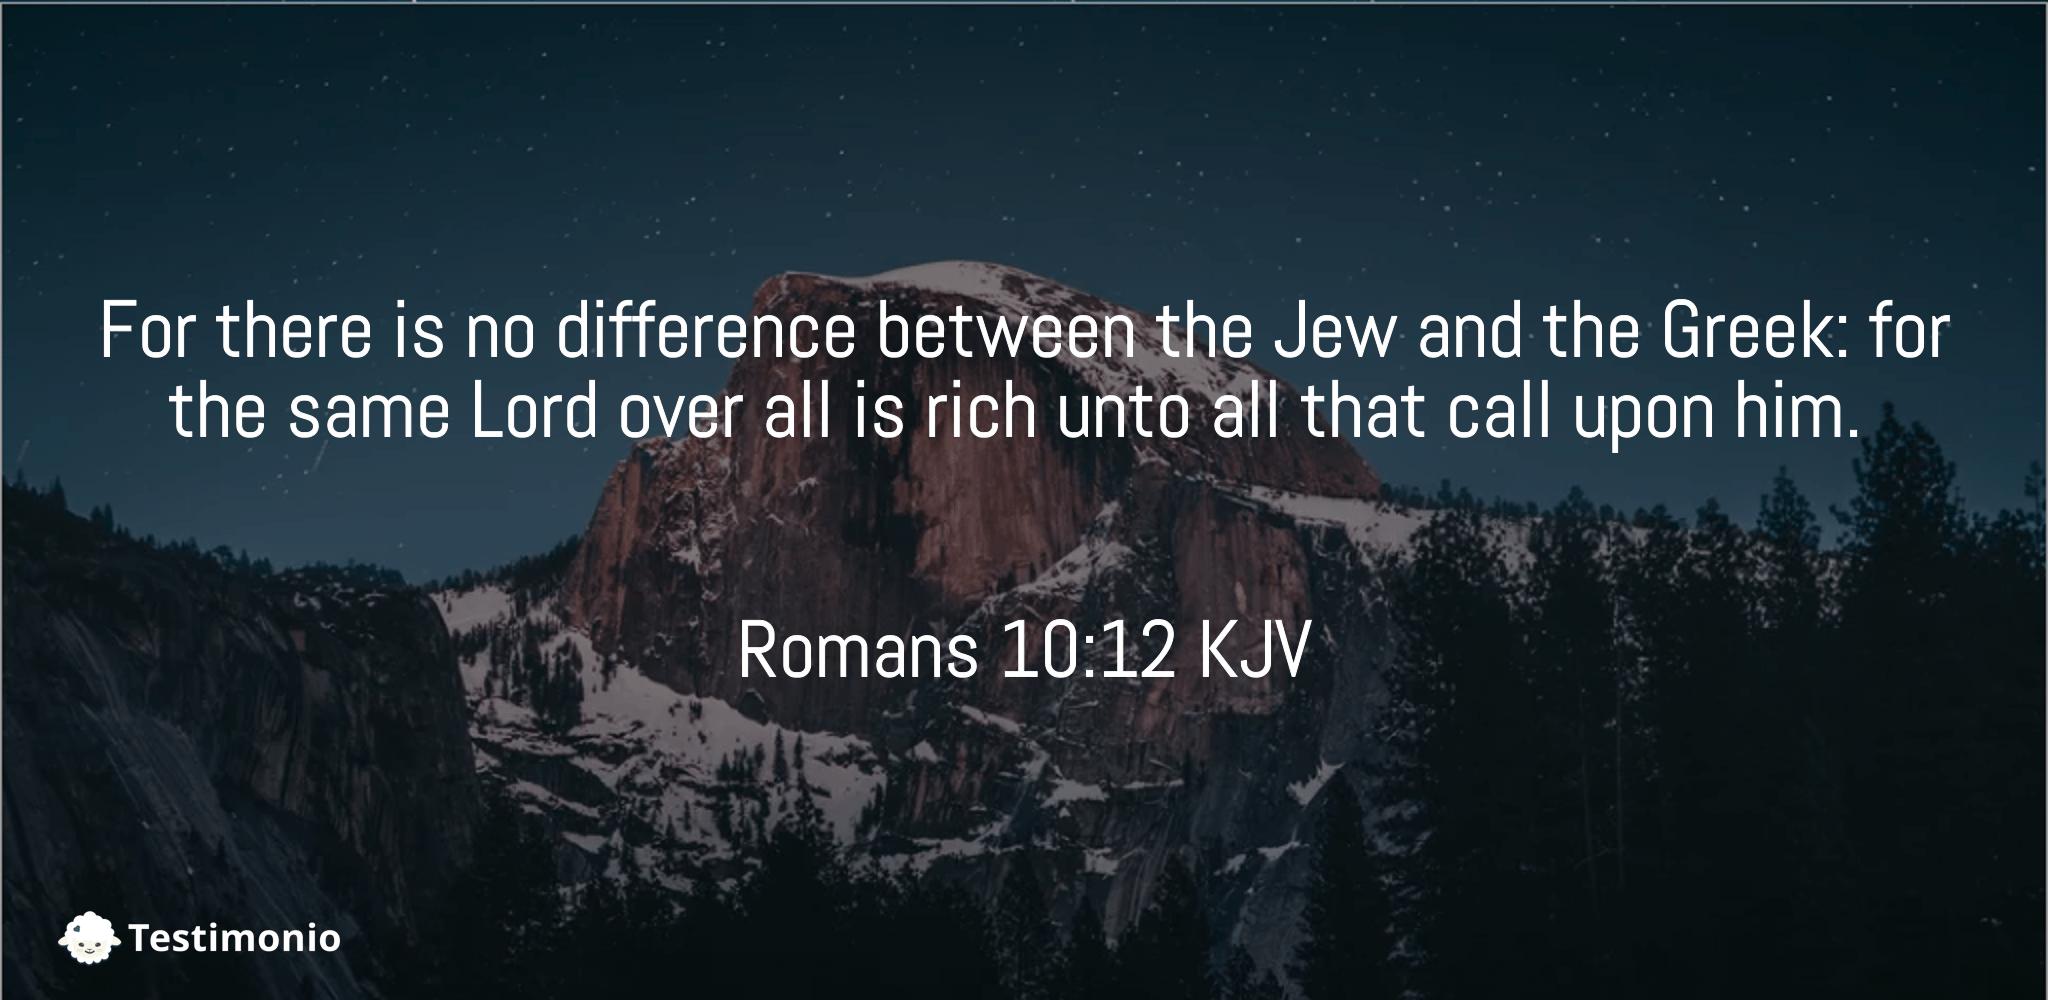 Romans 10:12